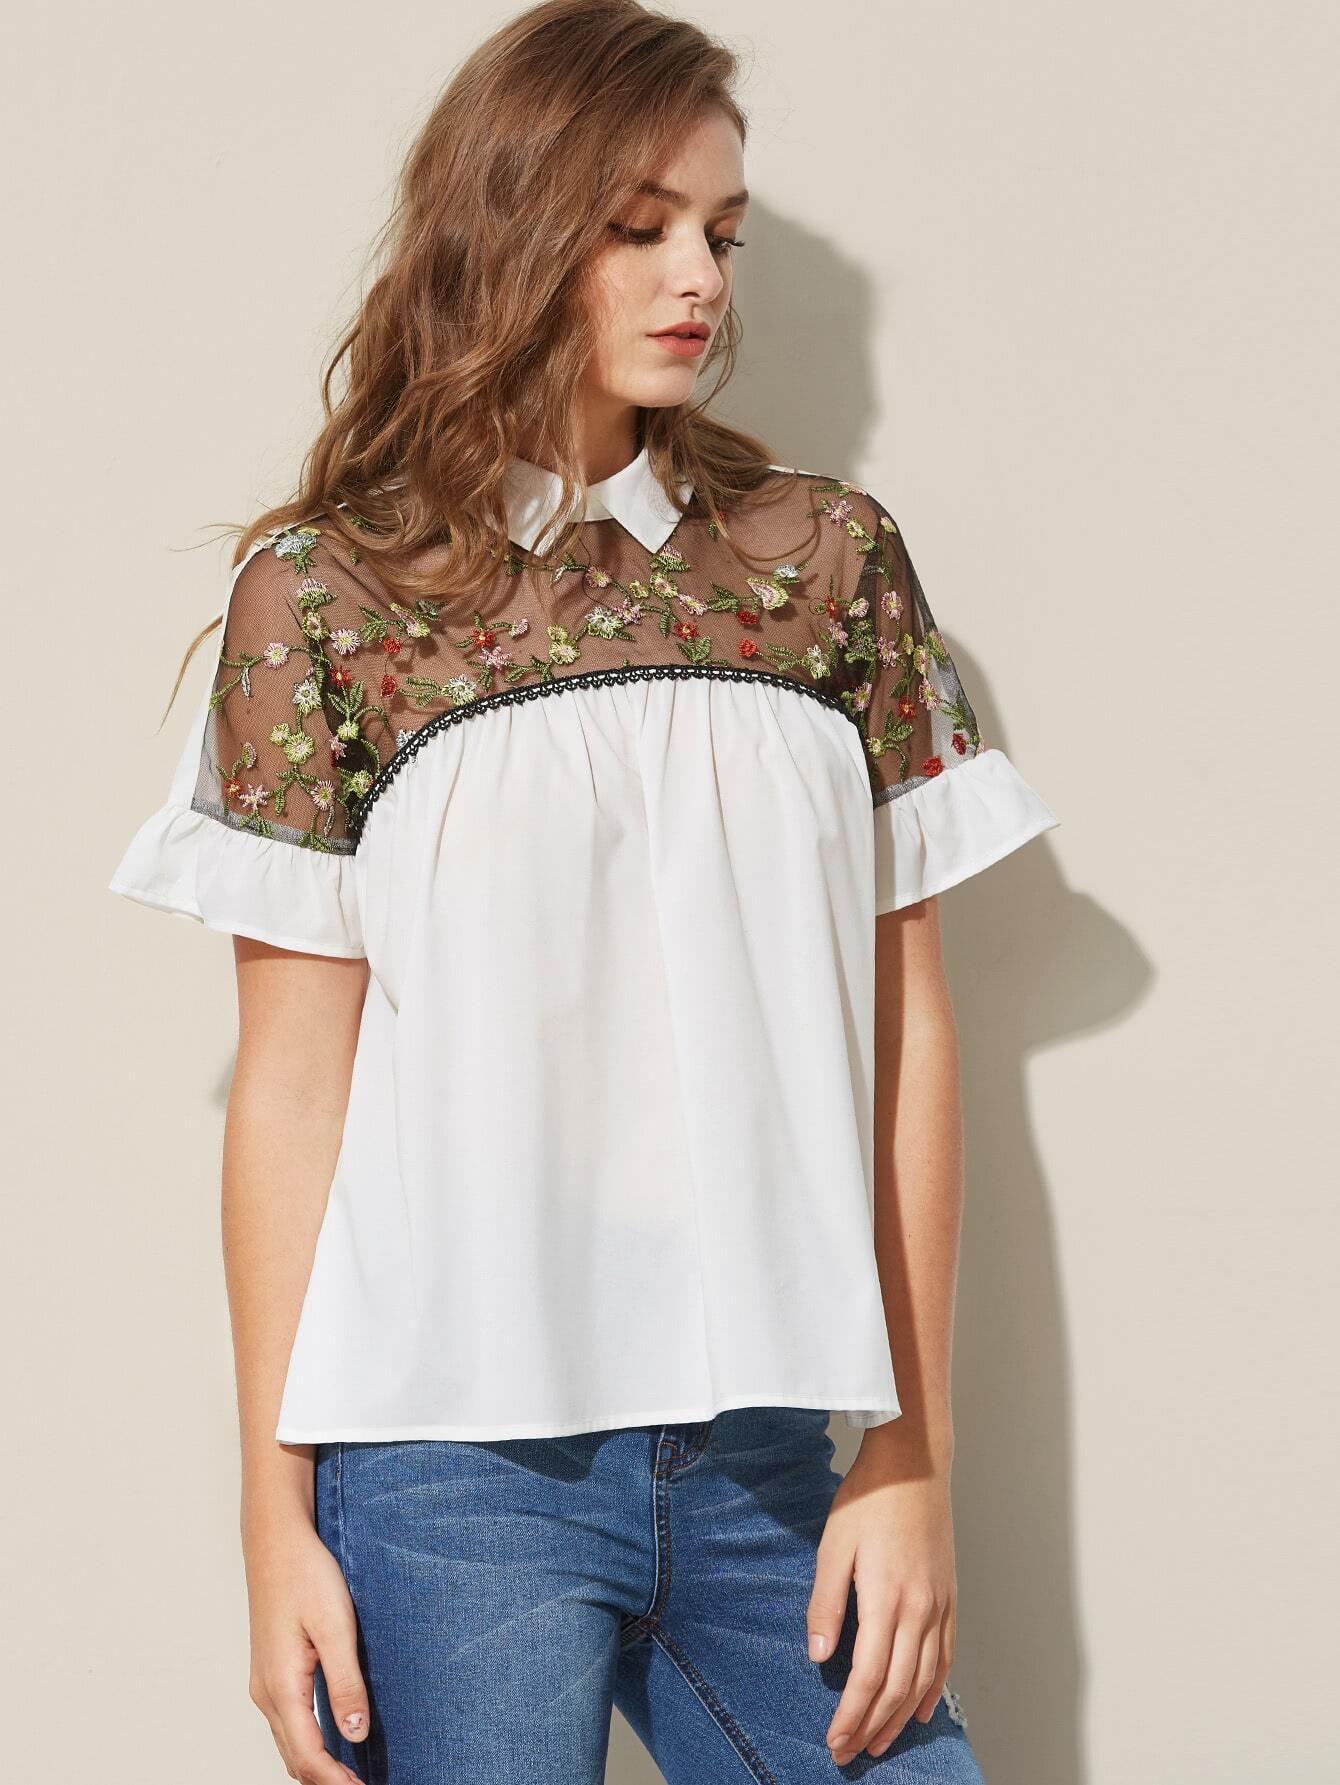 blouse170404701_2